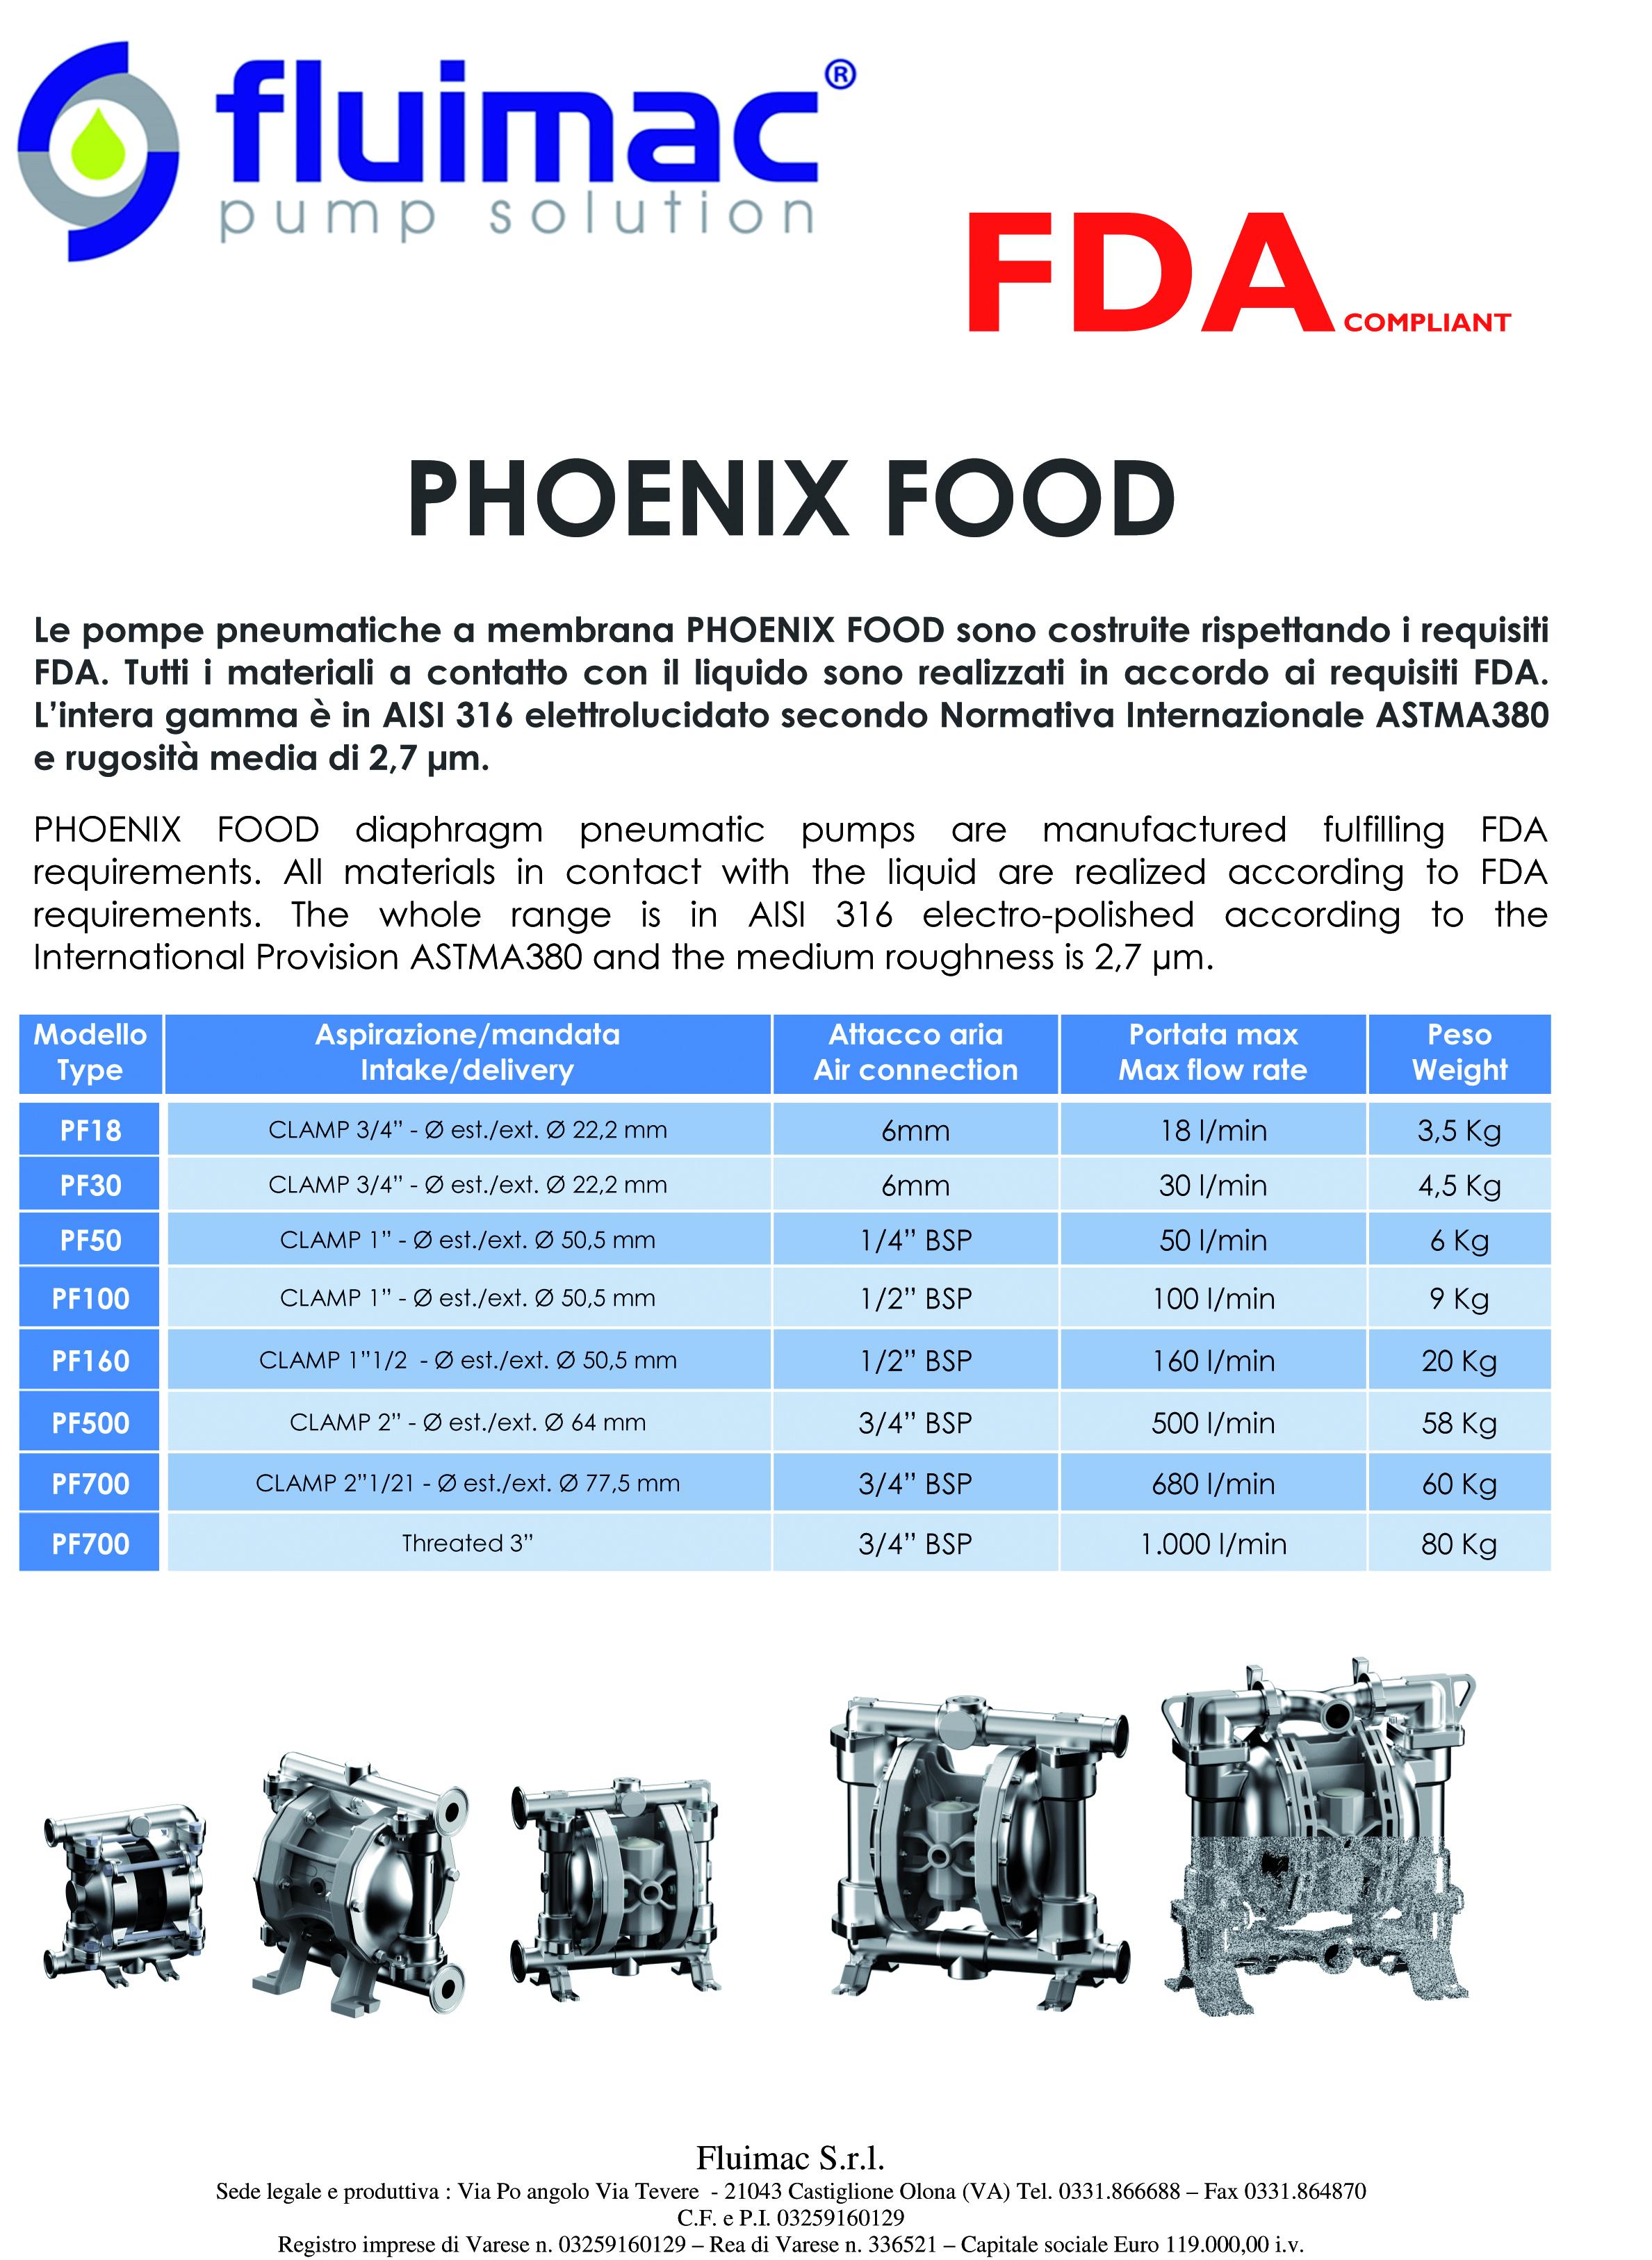 Microsoft Word - PHOENIX FOOD FDA VERSIONE PF